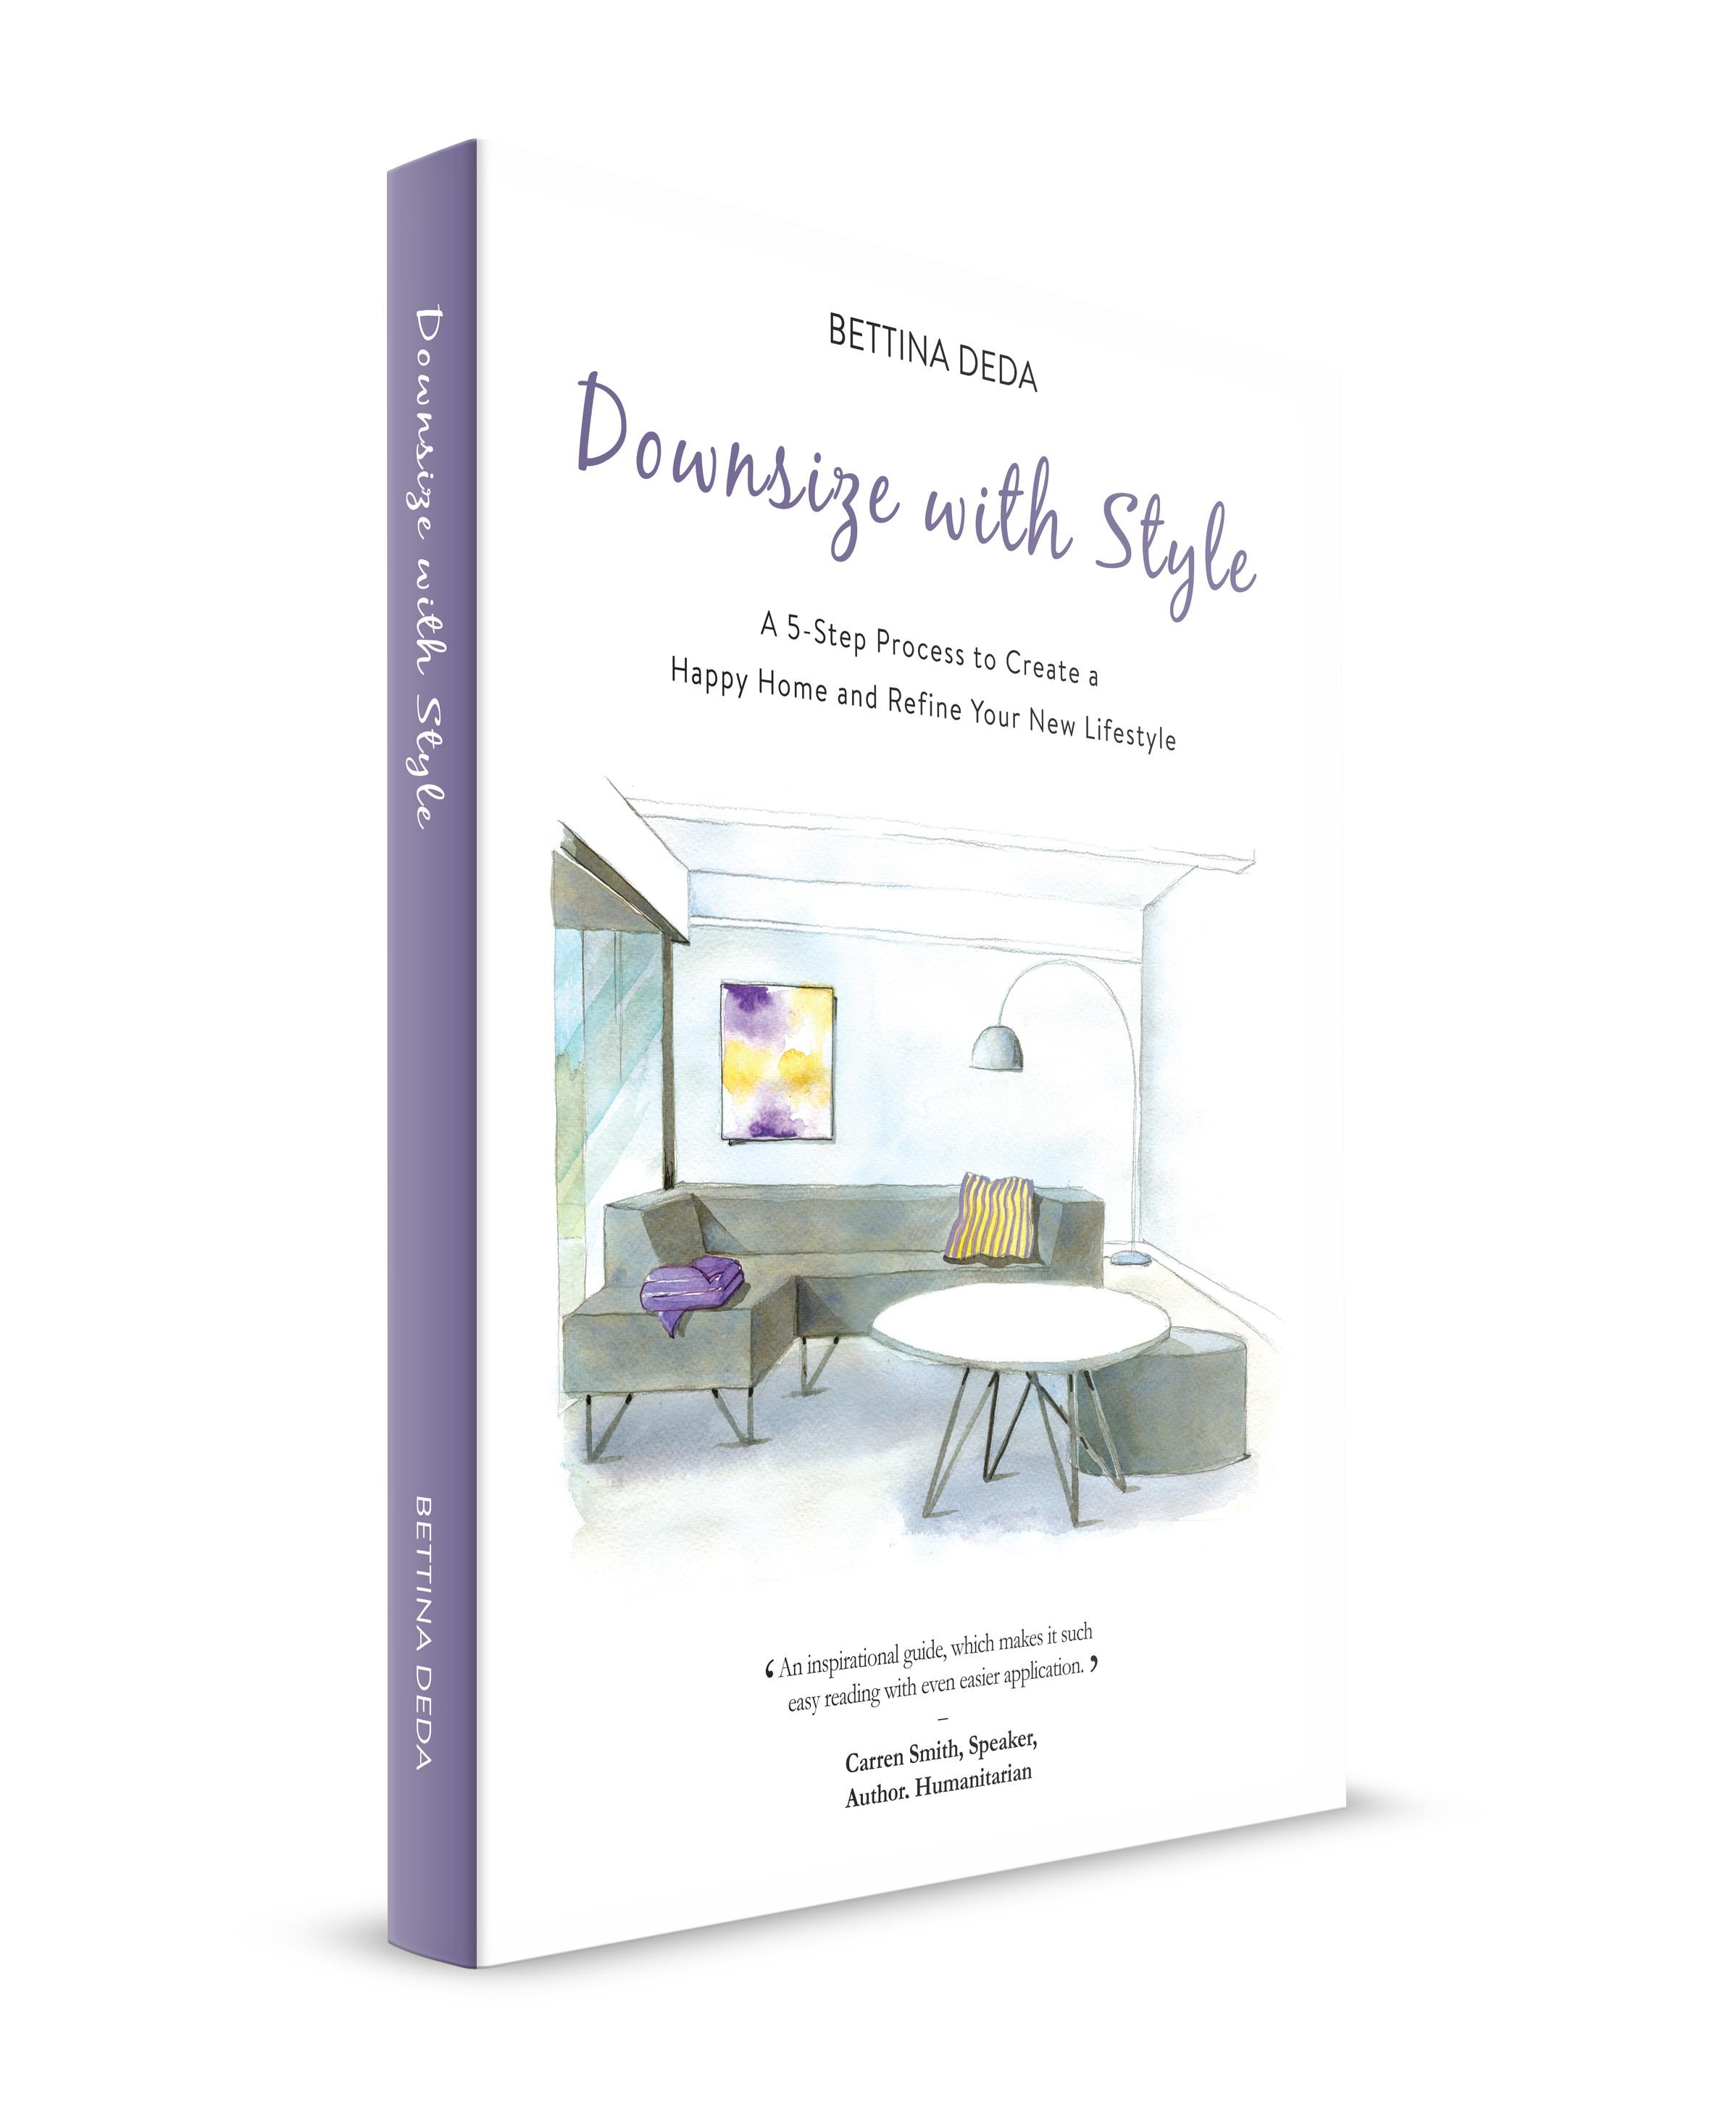 downsize-with-style-bettina-deda-home-downsizing-interior-design-advice